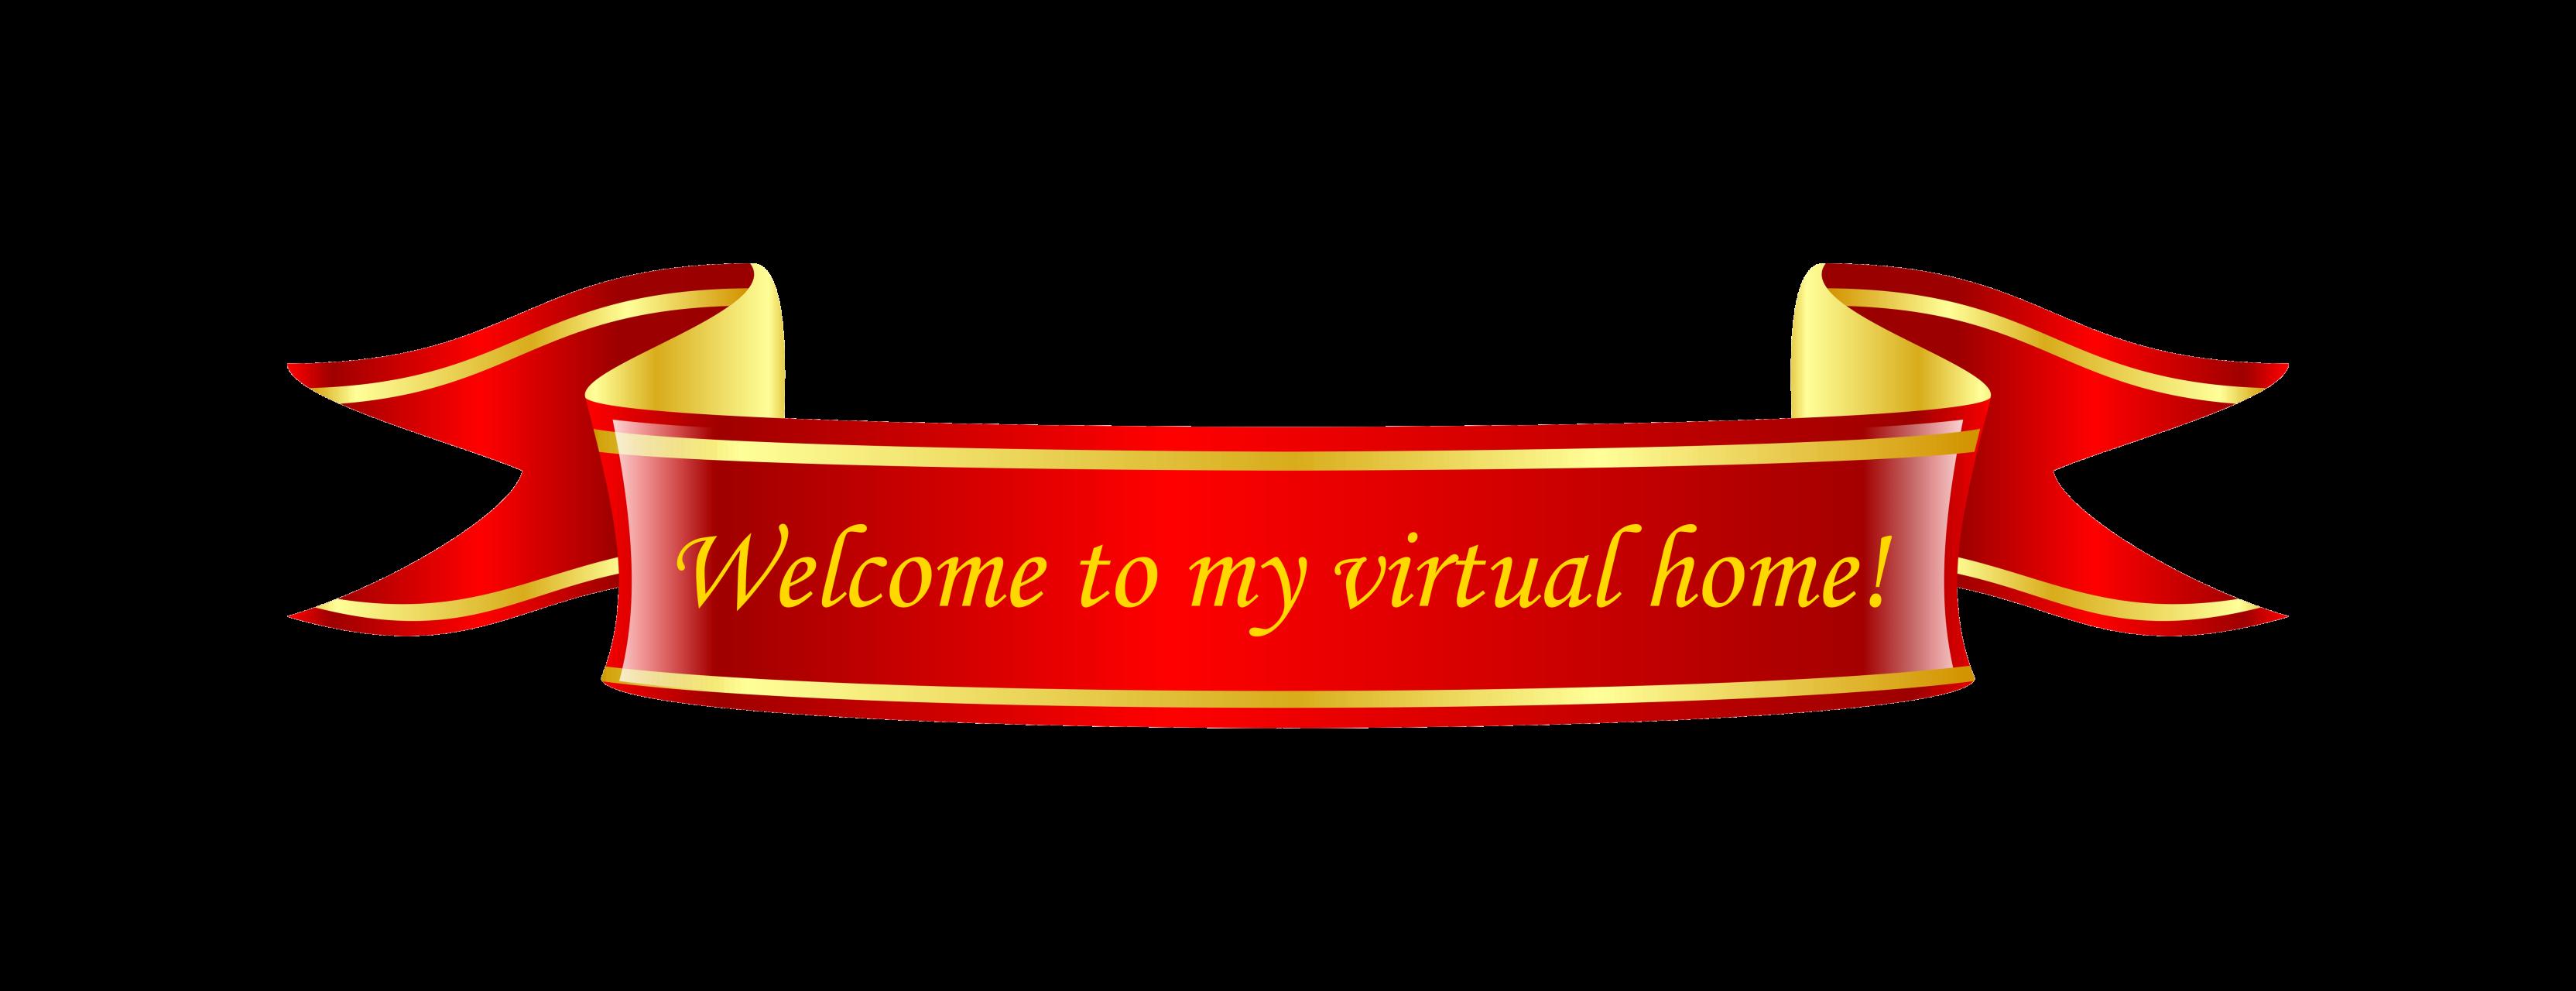 Jf garrard musings of. Website clipart welcome home sign